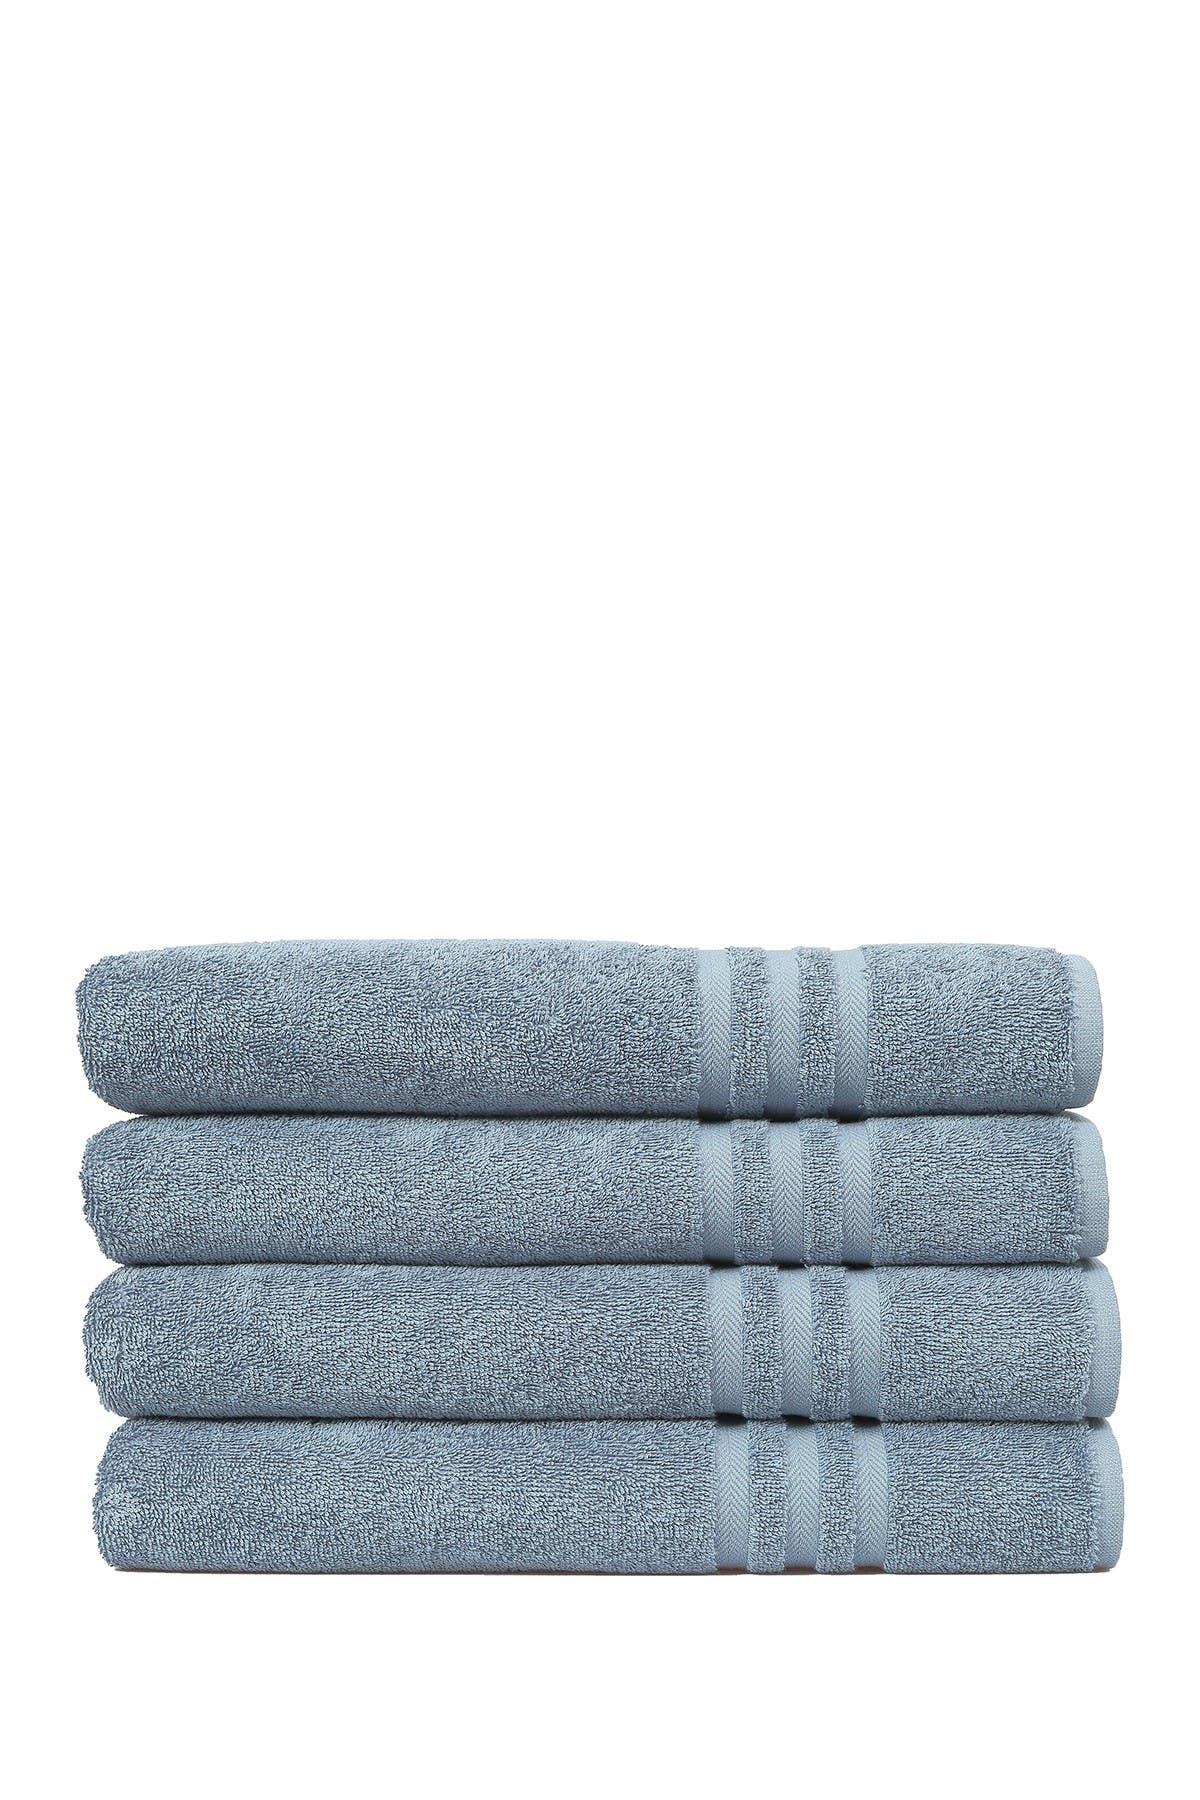 Image of LINUM HOME Denzi Bath Towels - Set of 4 - Denzi Blue